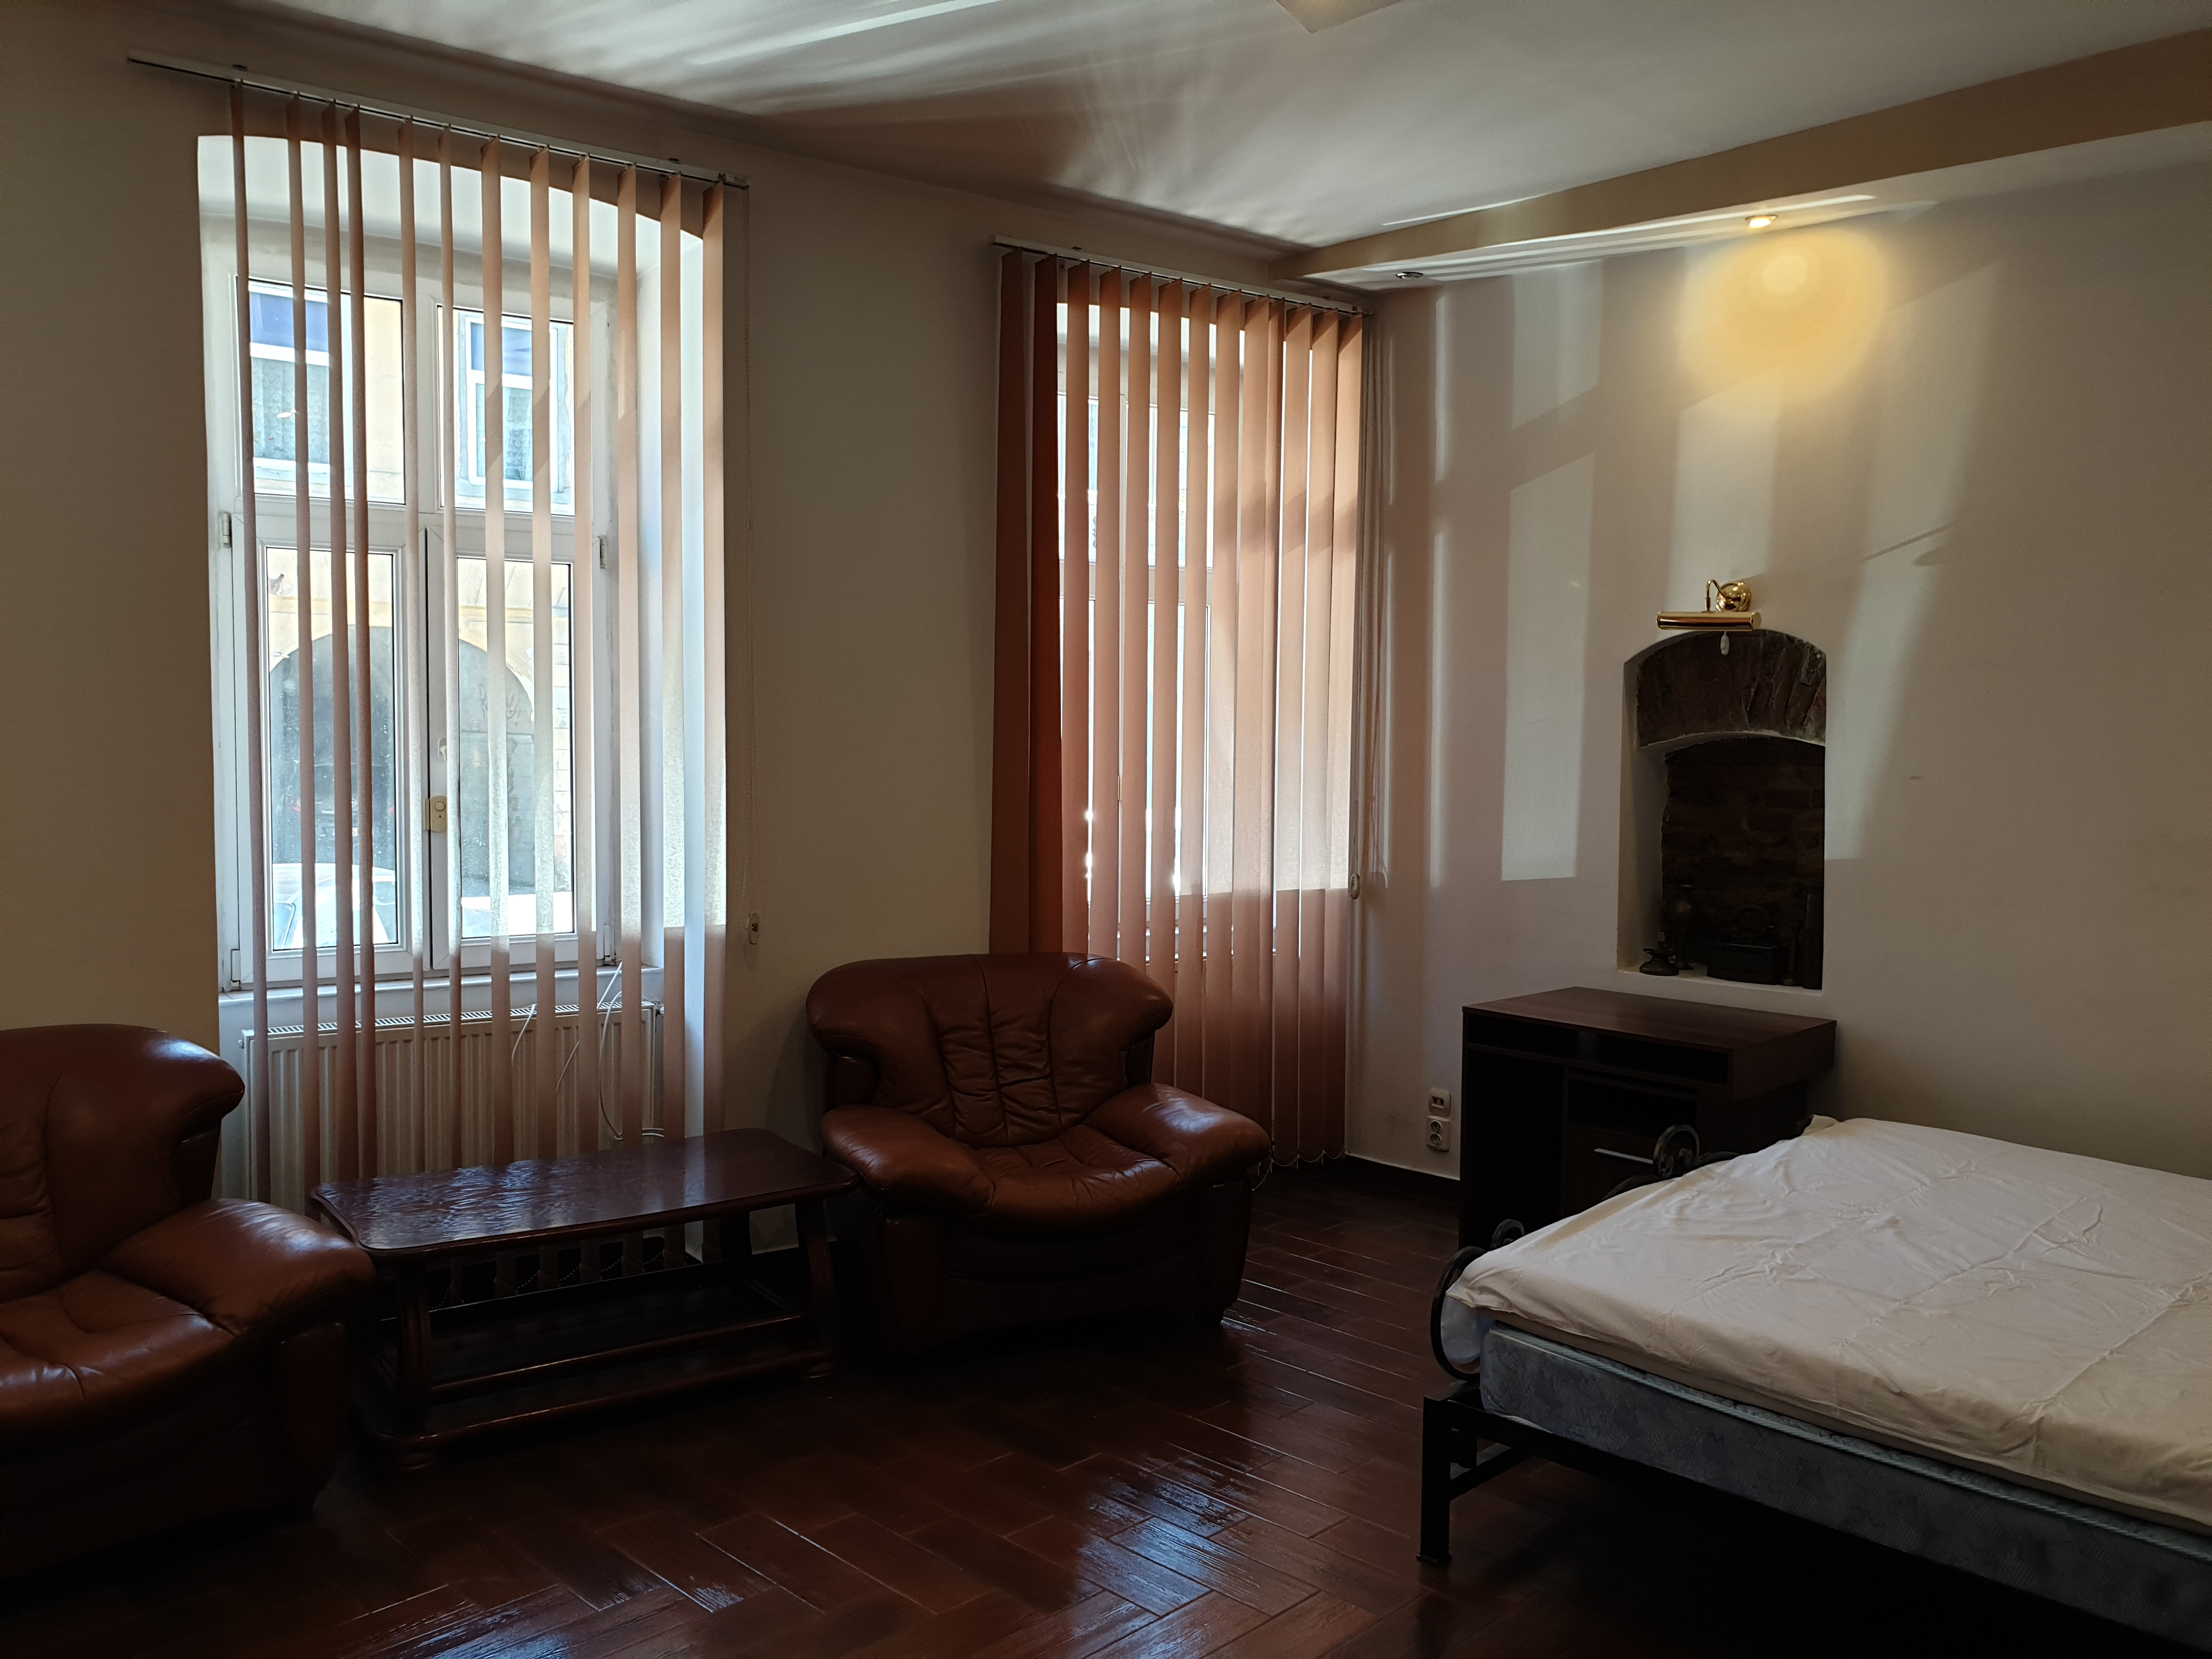 Exclusivitate  2 camere Centrul Istoric Brasov